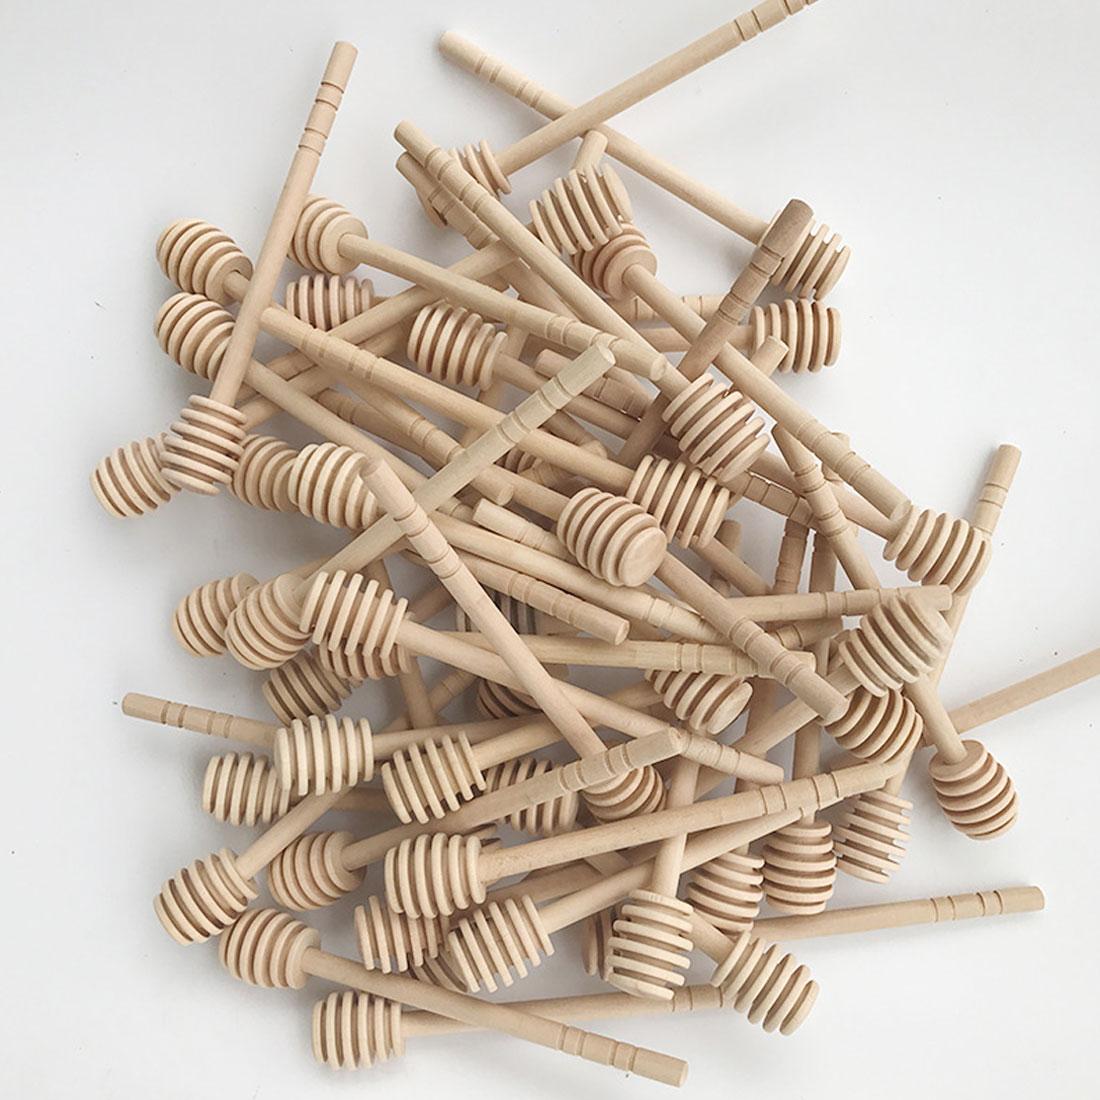 Top Sale Mini Wooden Honey Wood Honey Spoon Stir Bar For Honey Jar Supplies Long Handle Mixing Stick Dipper Dessert Tools